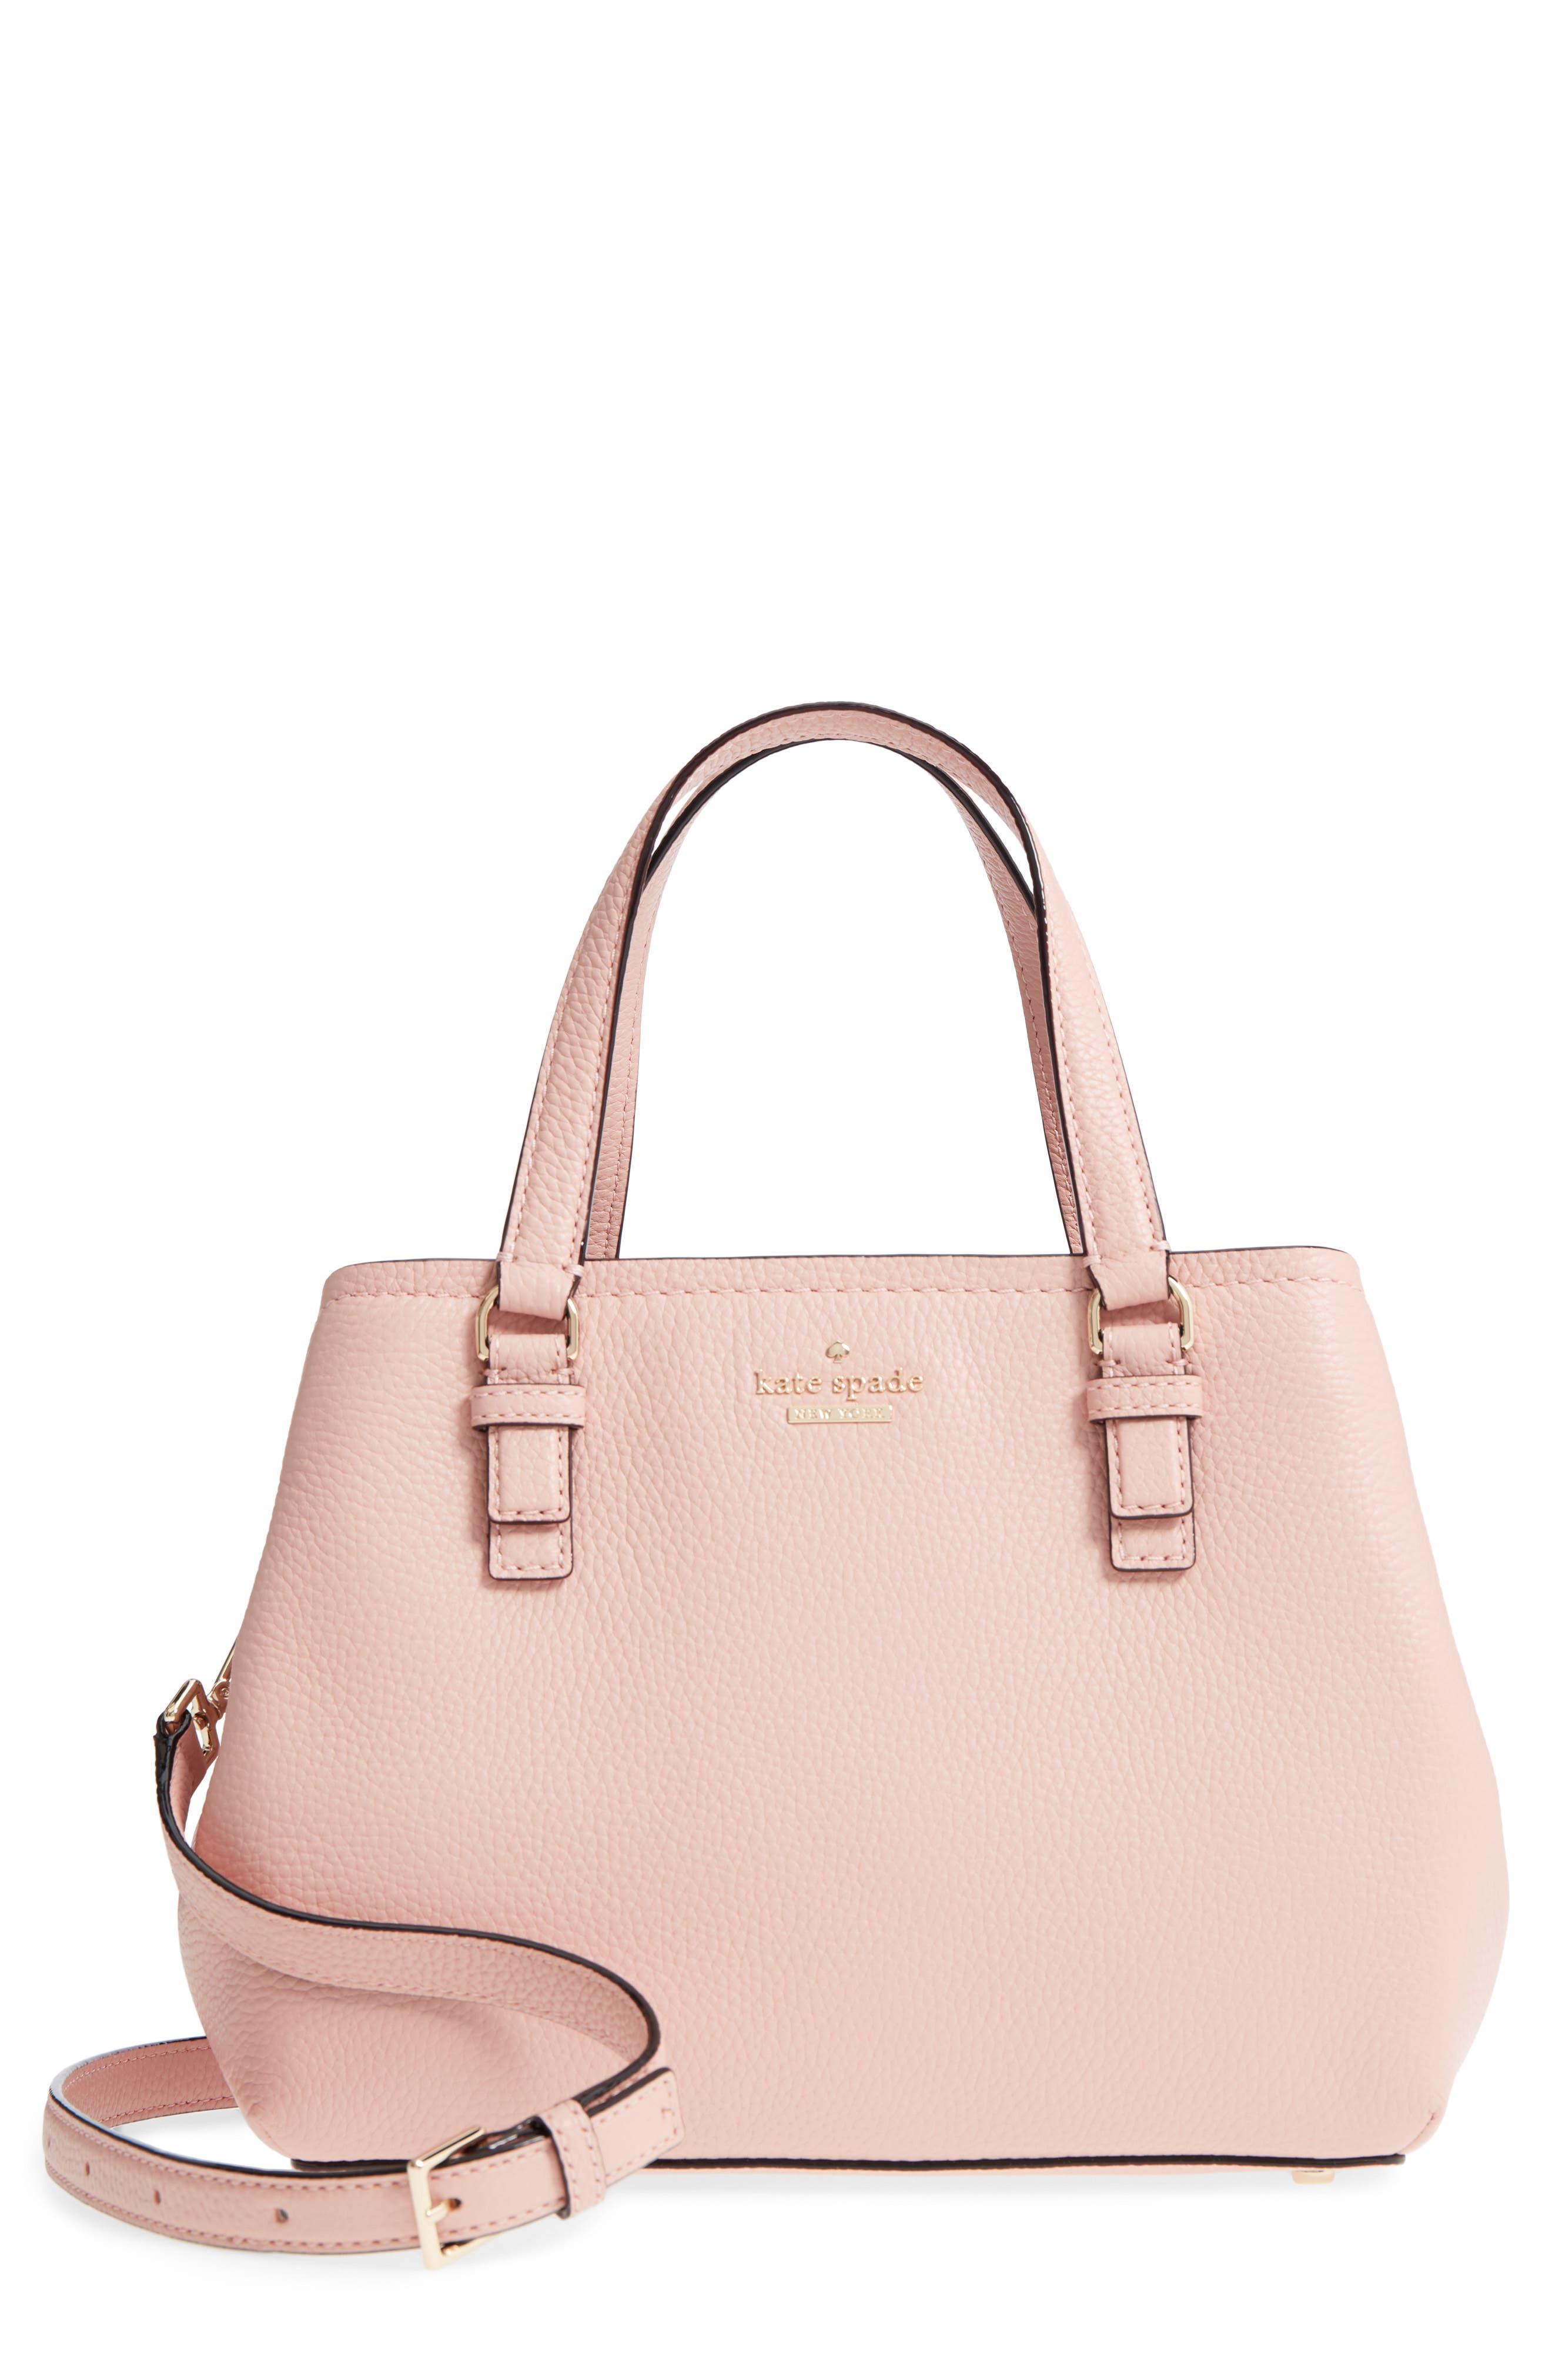 jackson street – small octavia leather satchel,                         Main,                         color, Rosy Cheeks